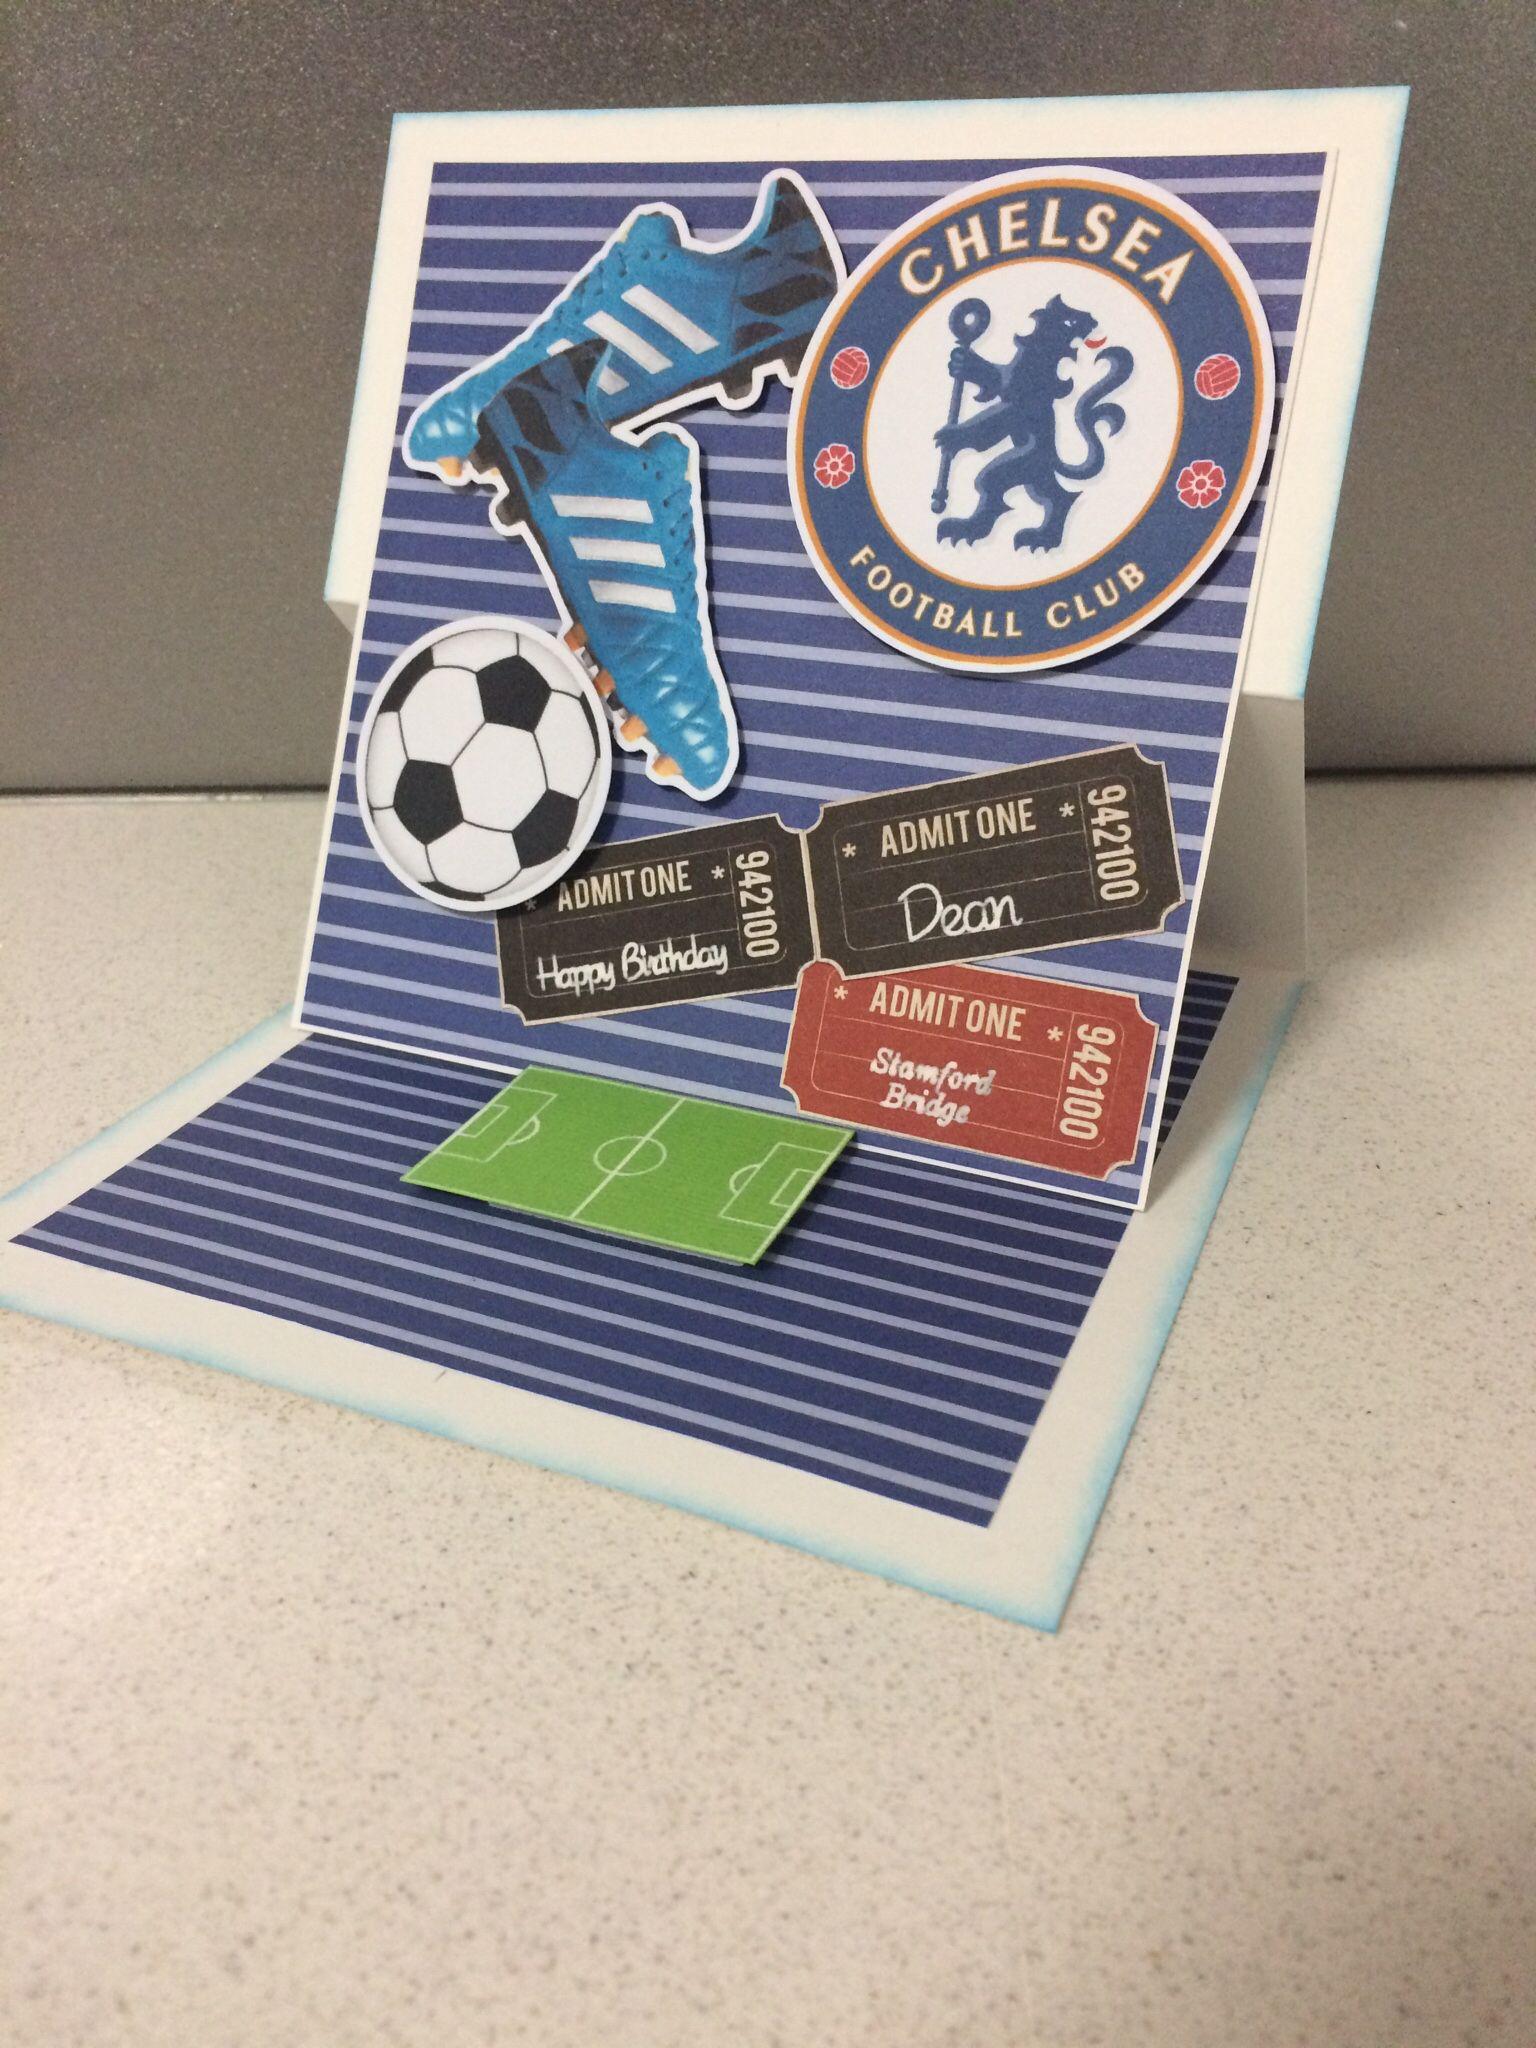 Chelsea football club birthday card birthdays pinterest card ideas chelsea football club birthday card bookmarktalkfo Gallery